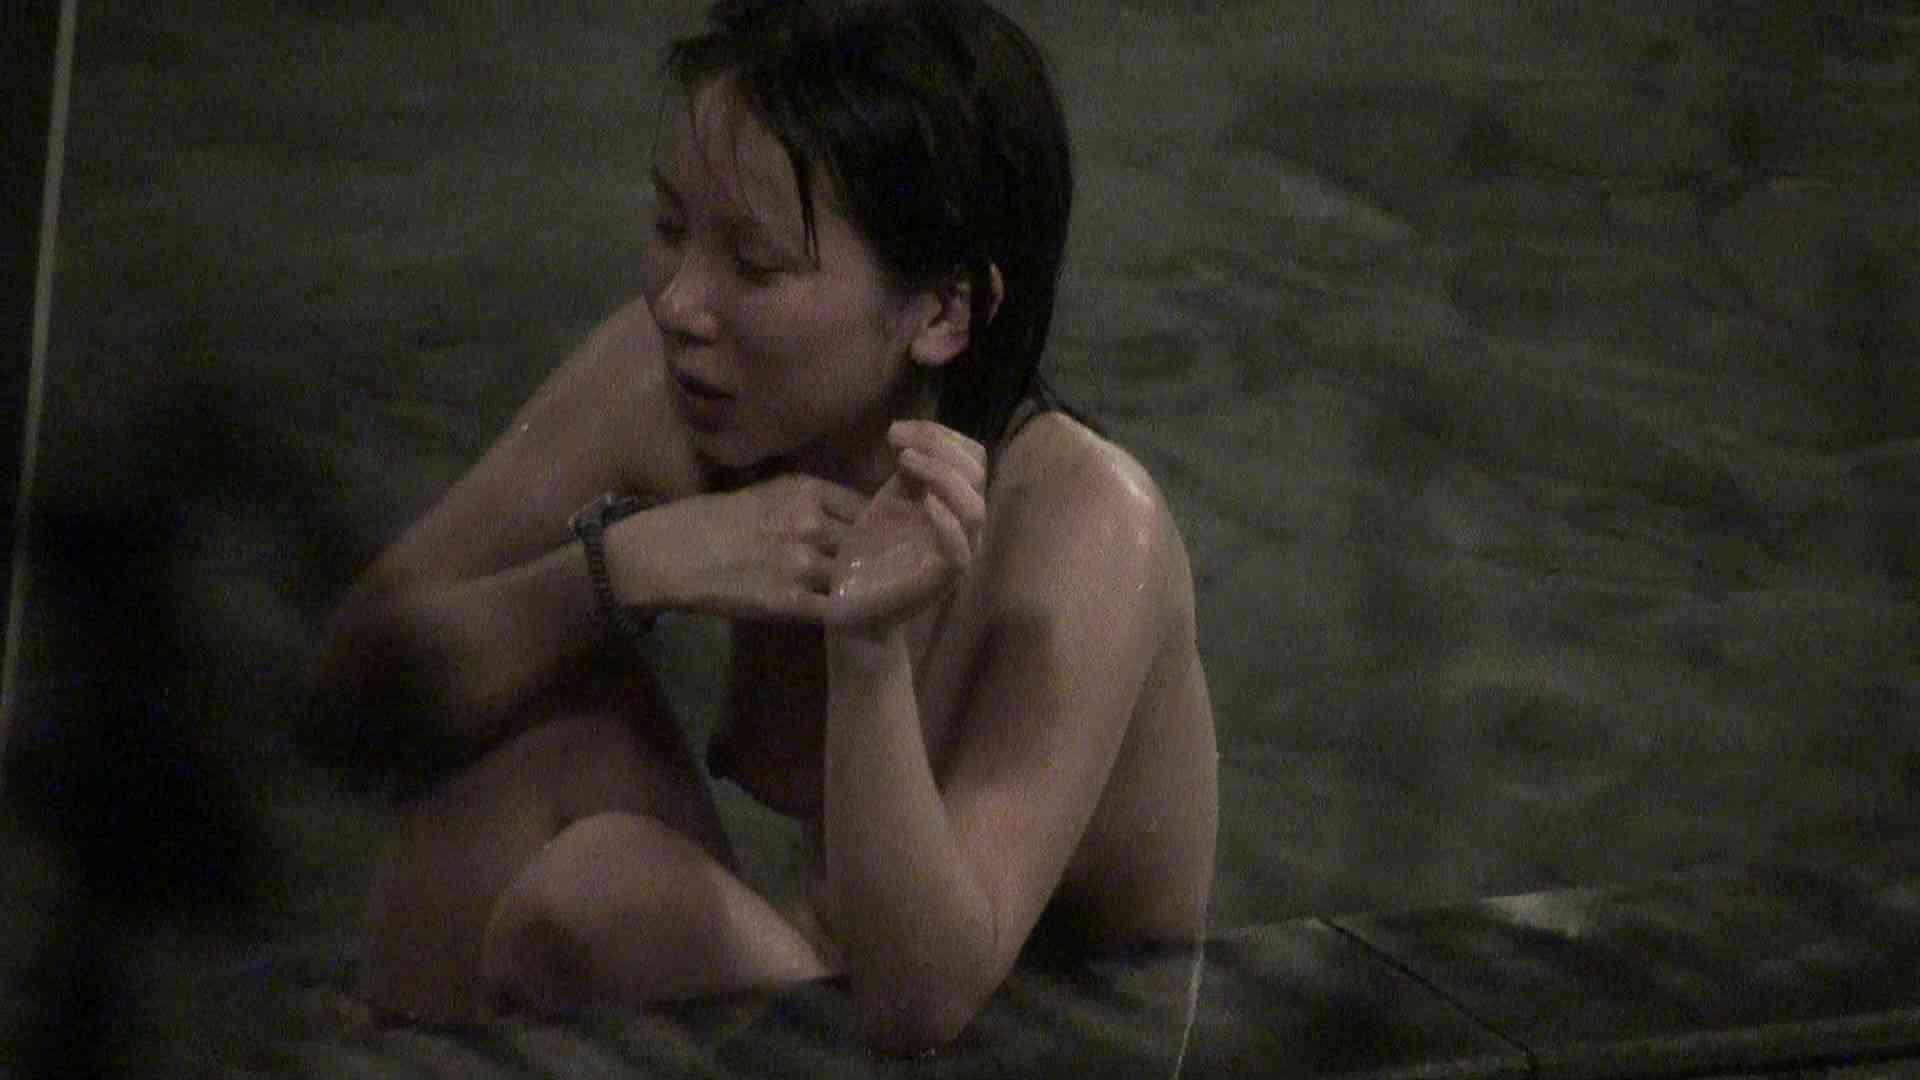 Aquaな露天風呂Vol.363 盗撮 | OLセックス  90画像 79